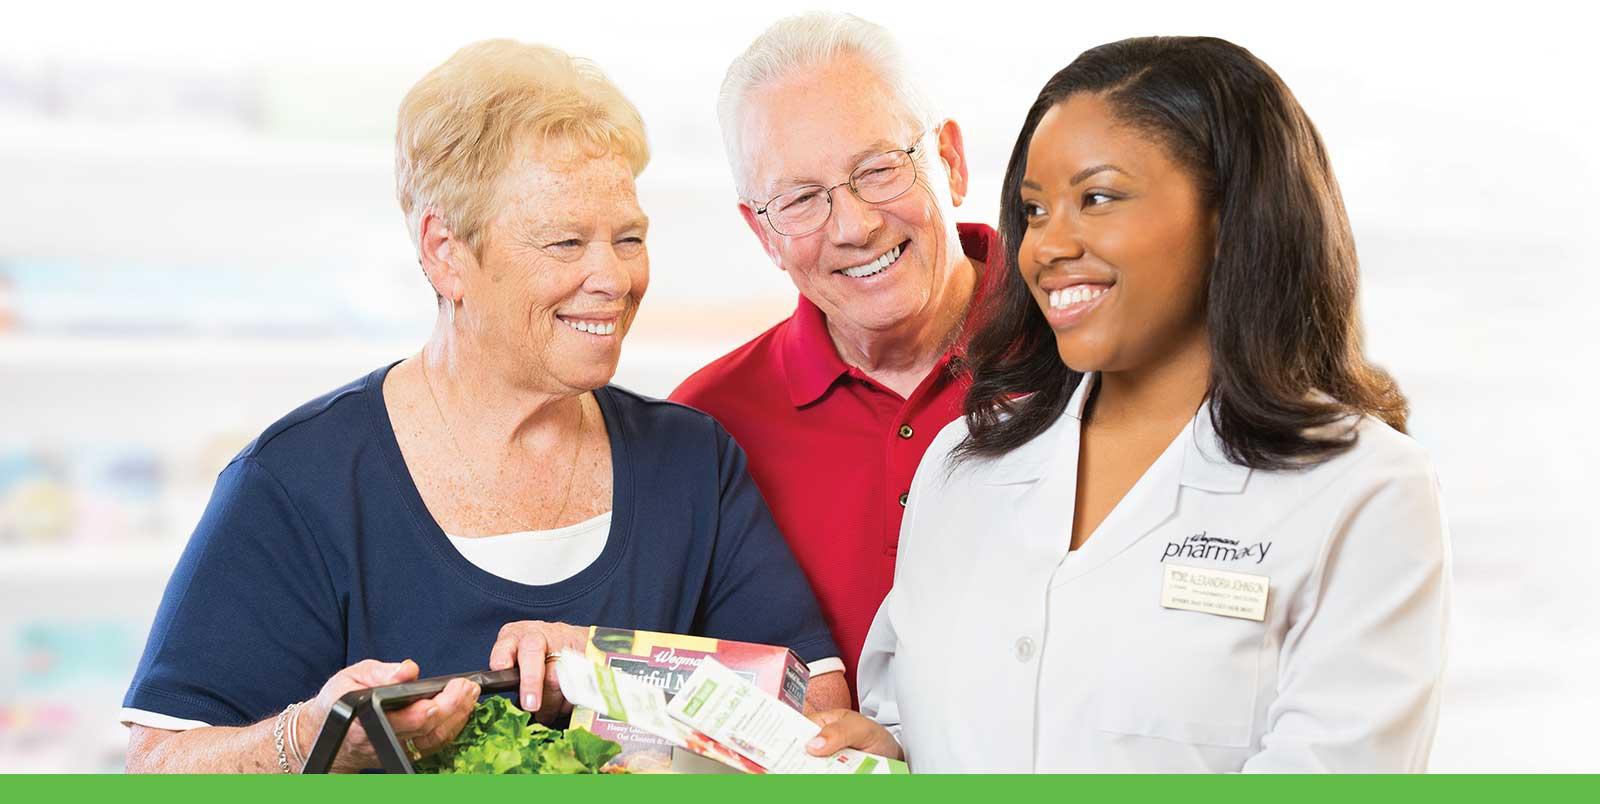 wegmans pharmacist with customers